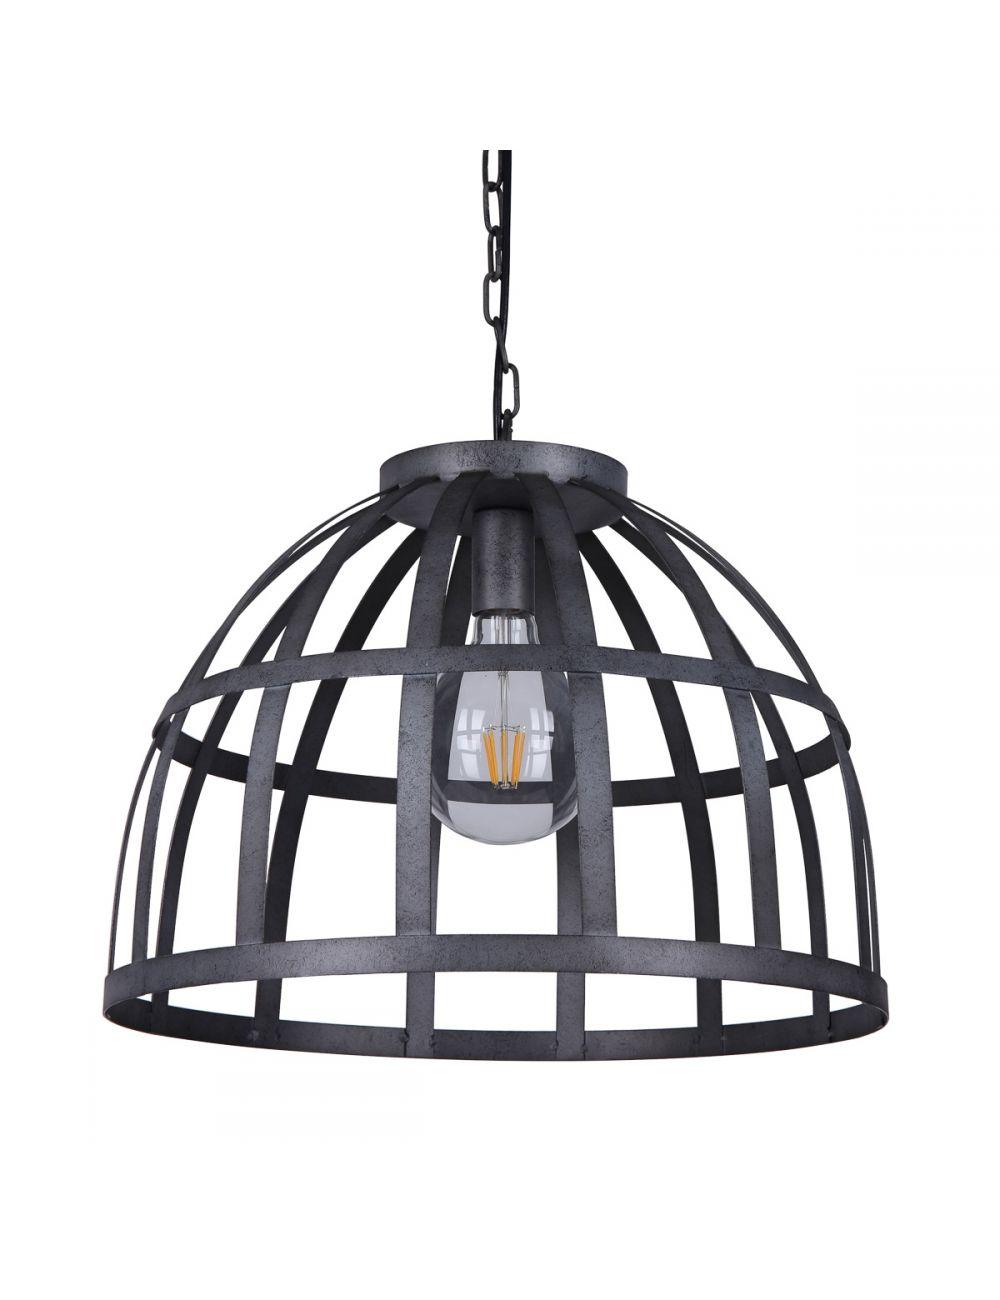 Lampa wisząca pojedyncza metalowa kuta Calera Italux PND-4114-40-1